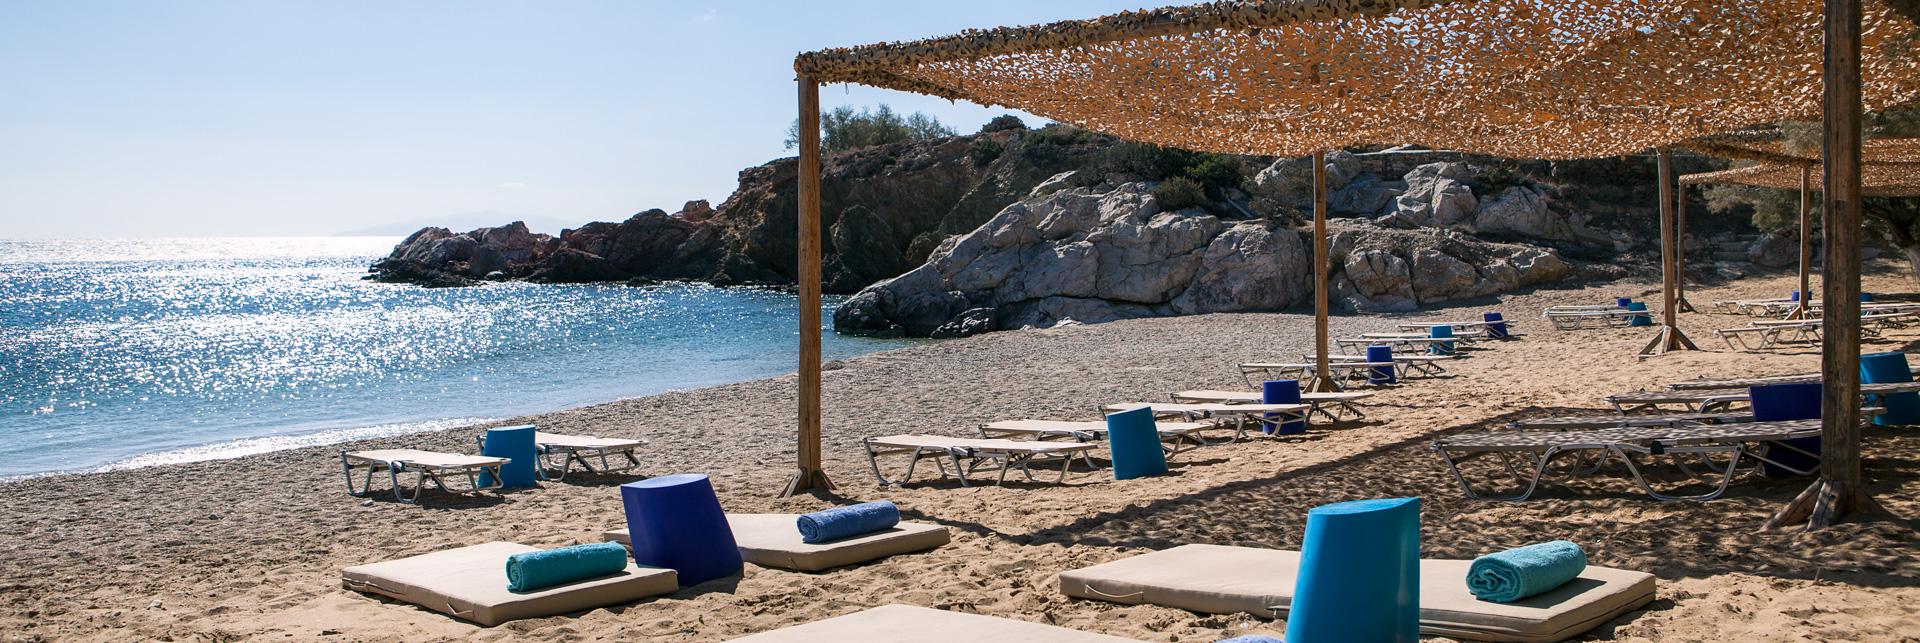 Antiparos beach greece - 2 10